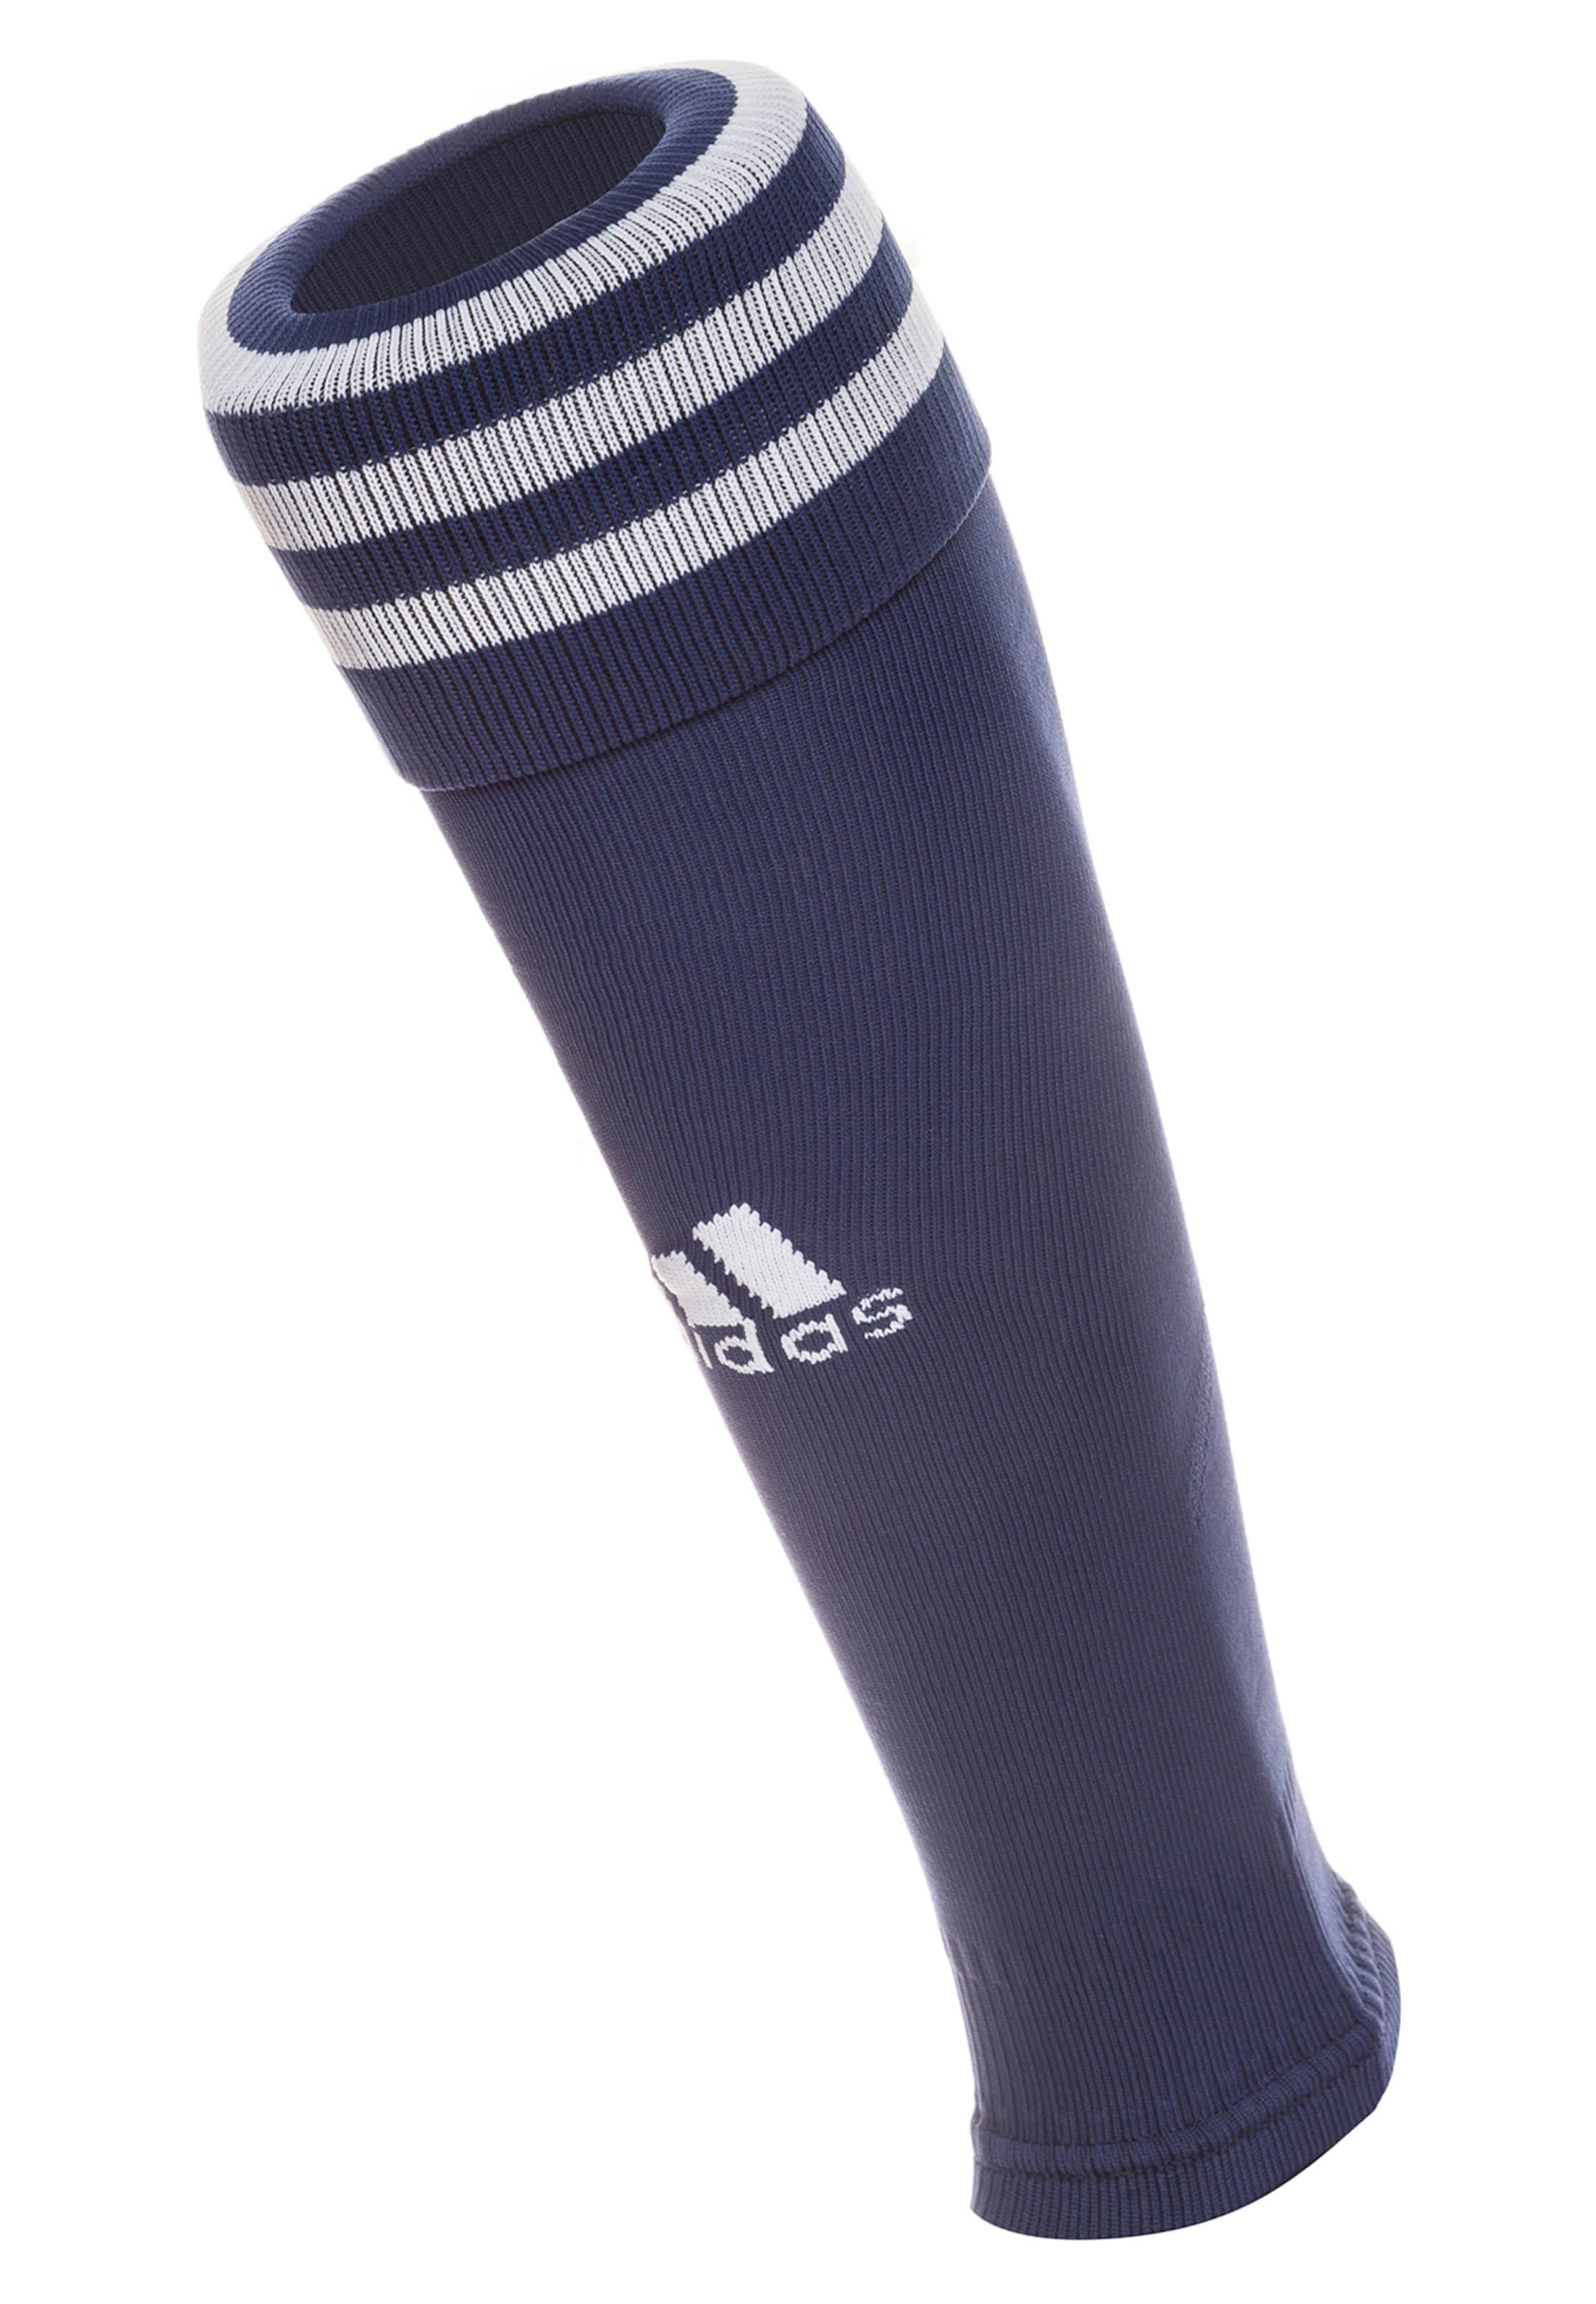 Sleeve 18' Adidas Stutzen DunkellilaWeiß Performance 'team In cTlF15uKJ3